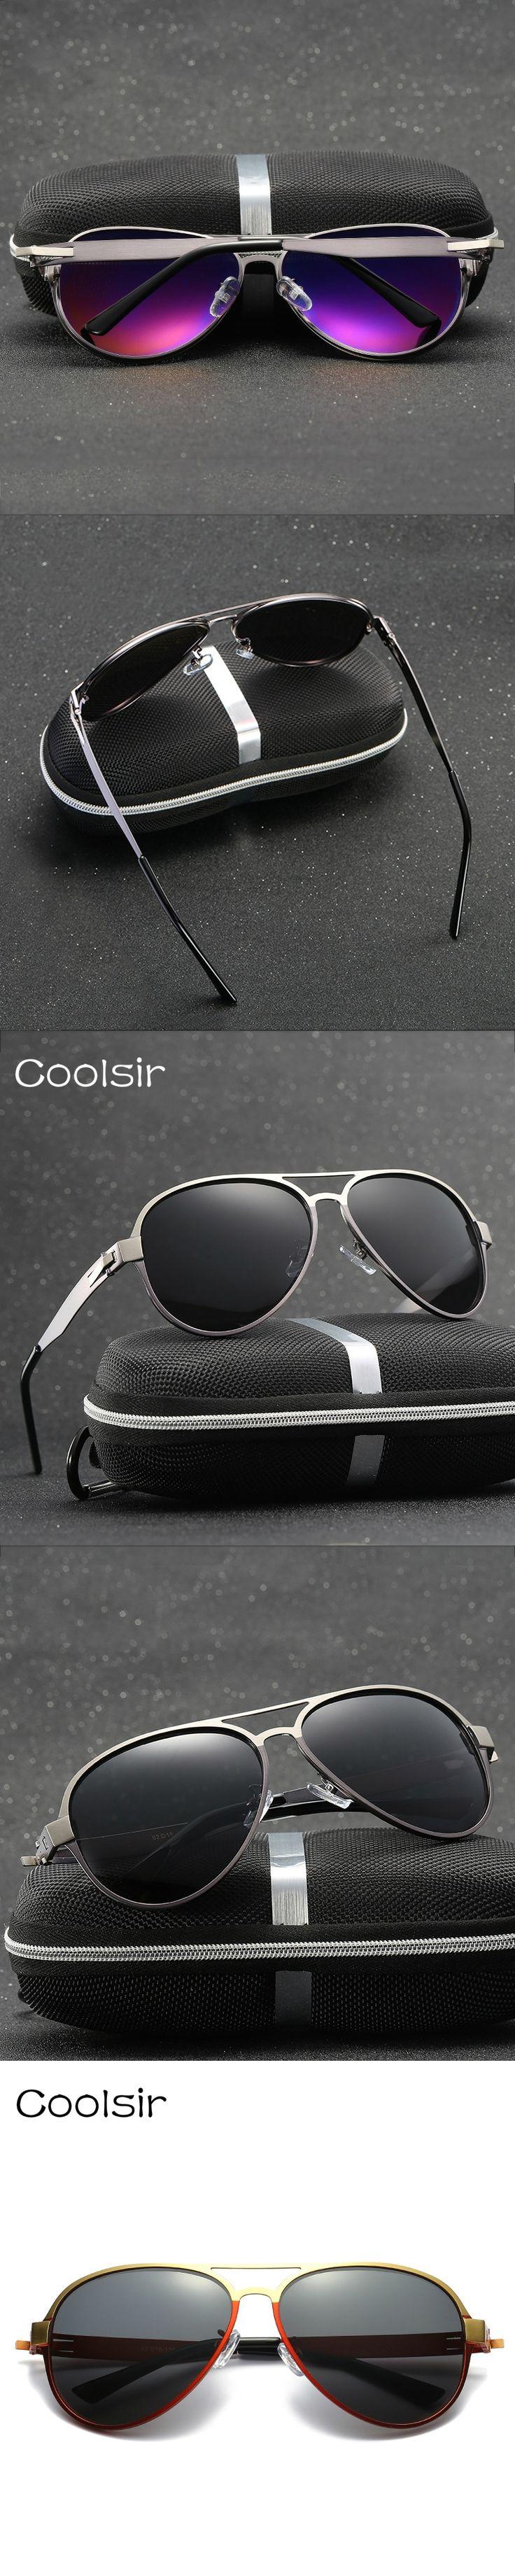 Hot Metal Frame Vintage Polarized Aviator Sunglasses Men Fashion Classic Brand Designer Driving Eyewear Lentes De Sol Hombre